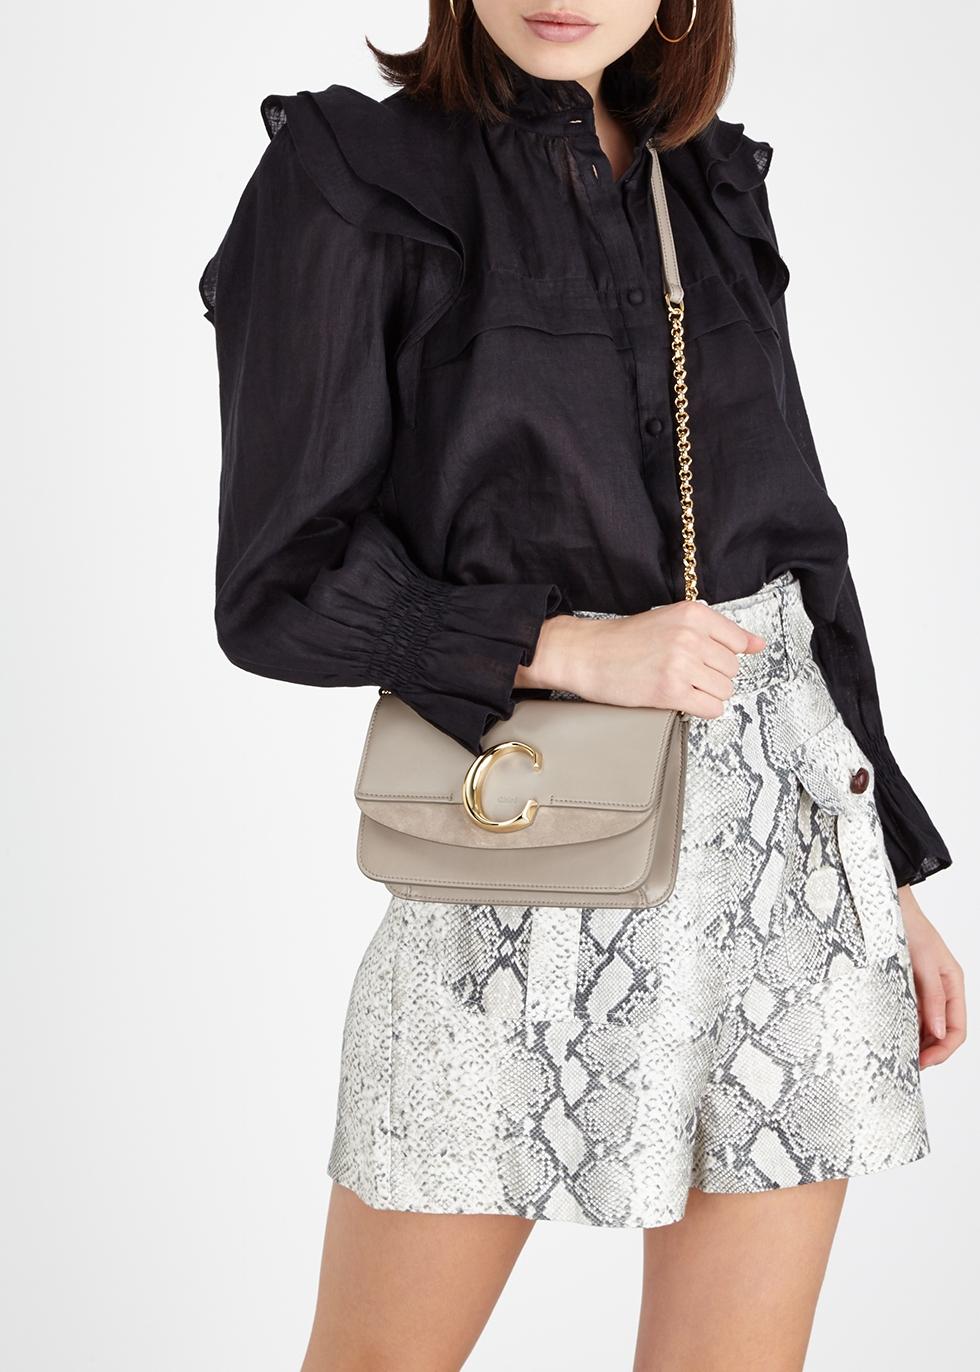 a9dda9459614a Chloé Chloé C mini leather shoulder bag - Harvey Nichols